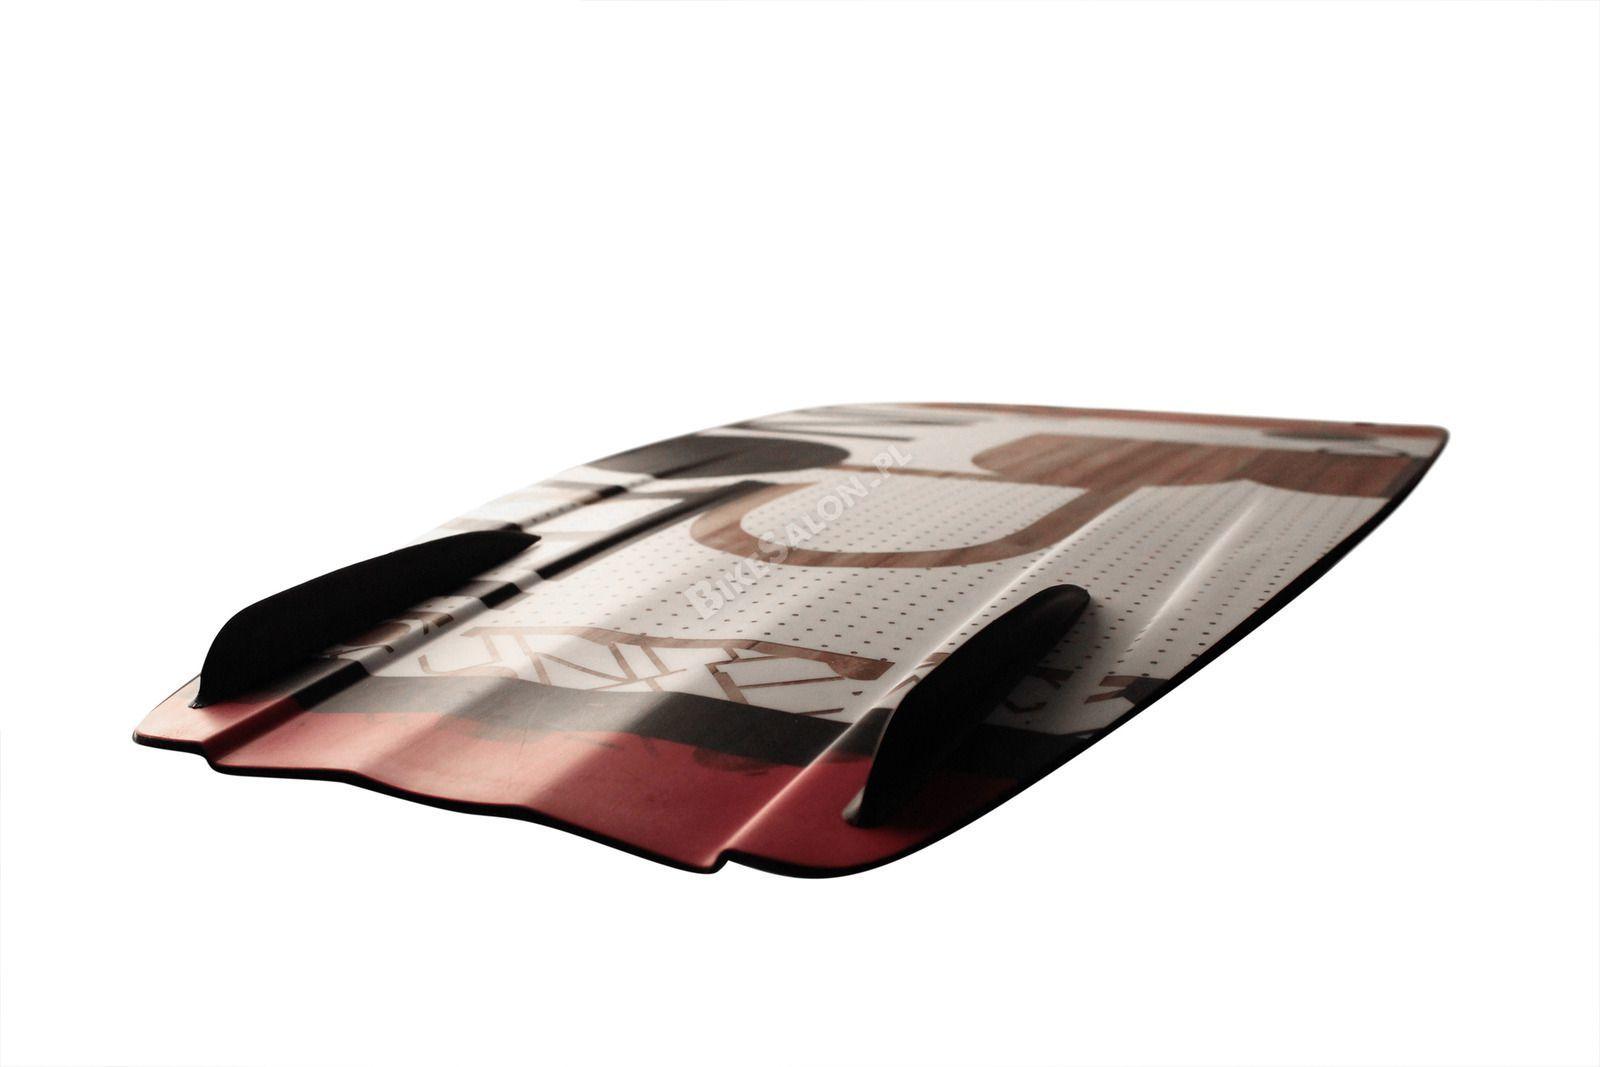 Deska wakeboardowa Brunotti Propulsion background